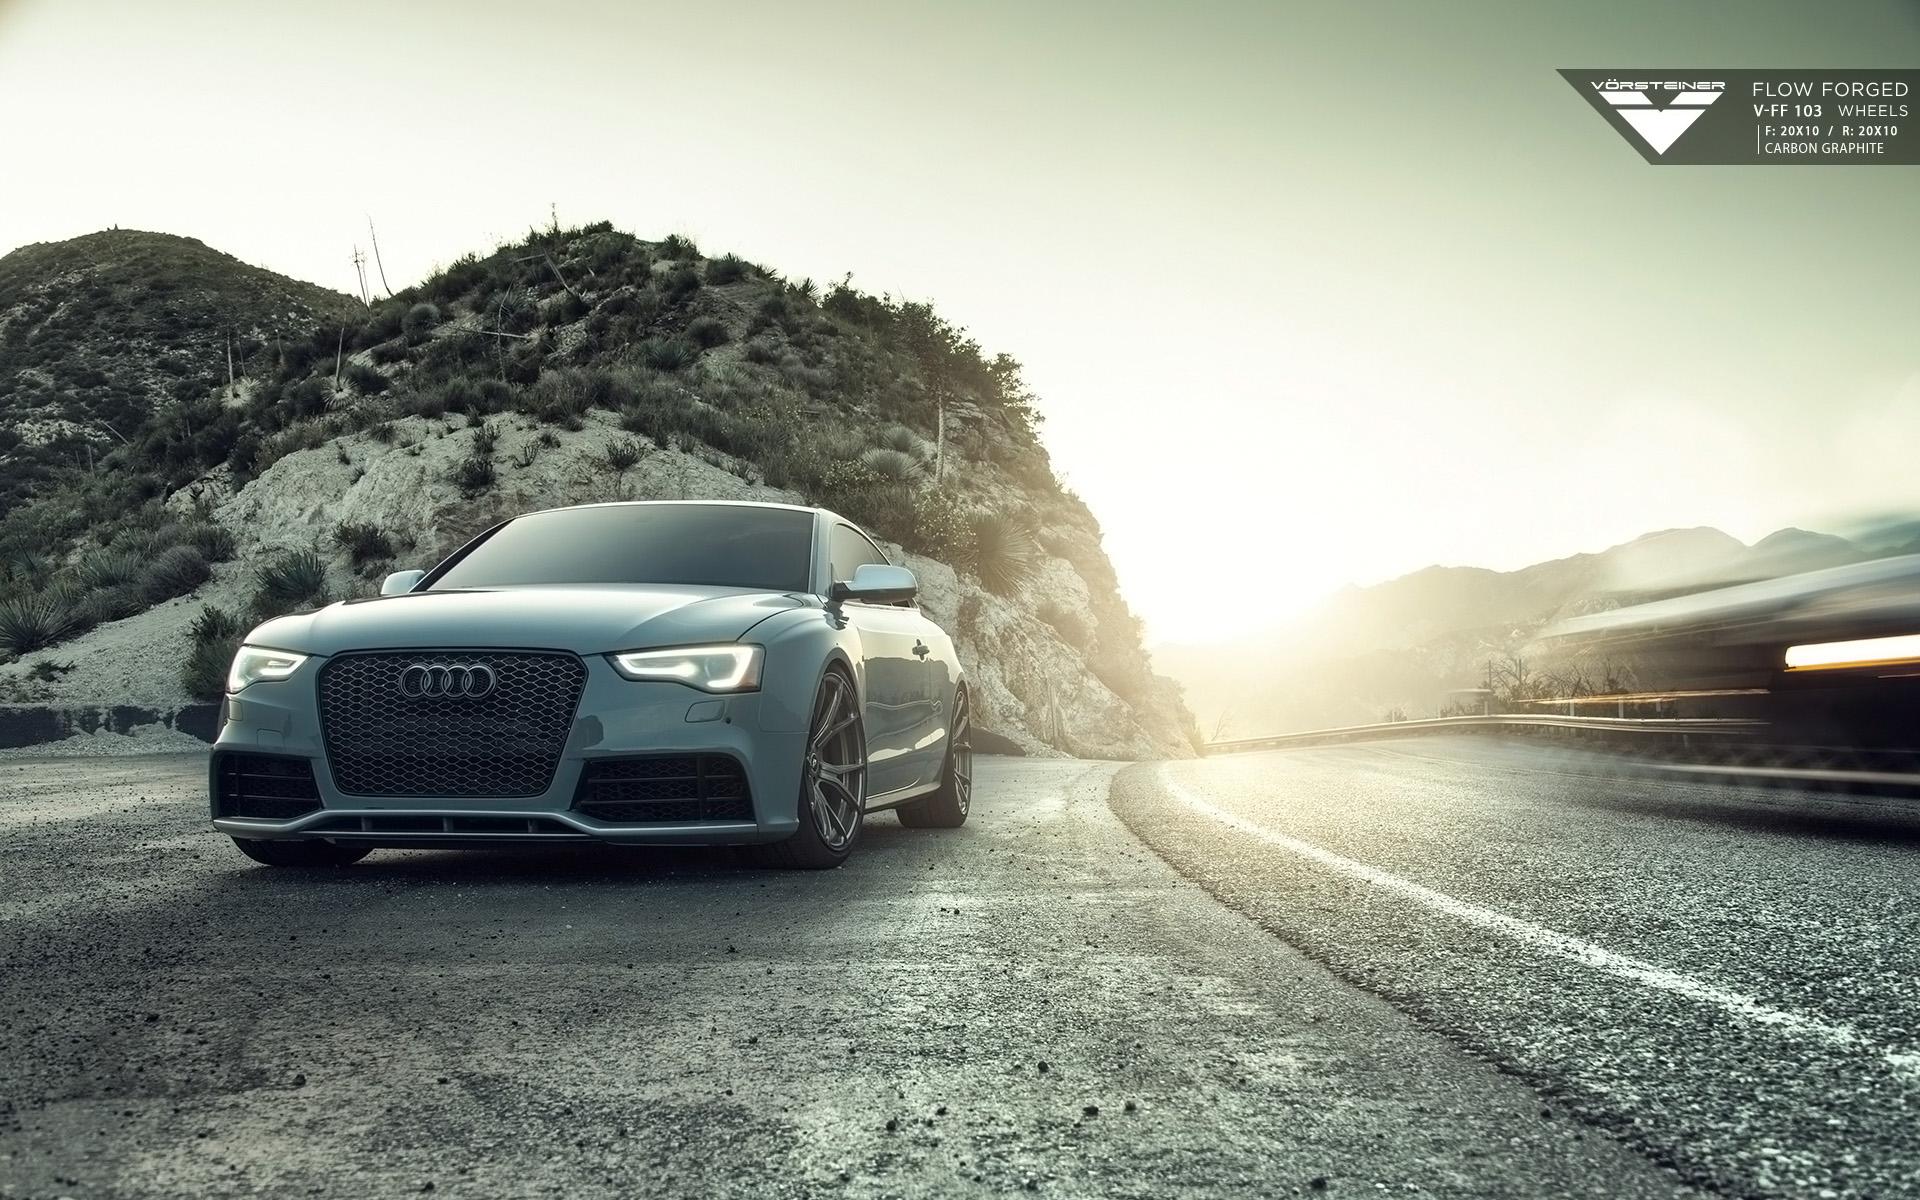 Audi Rs Q5 >> 2015 Vorsteiner Audi RS5 V FF 103 Wallpaper | HD Car Wallpapers | ID #5995